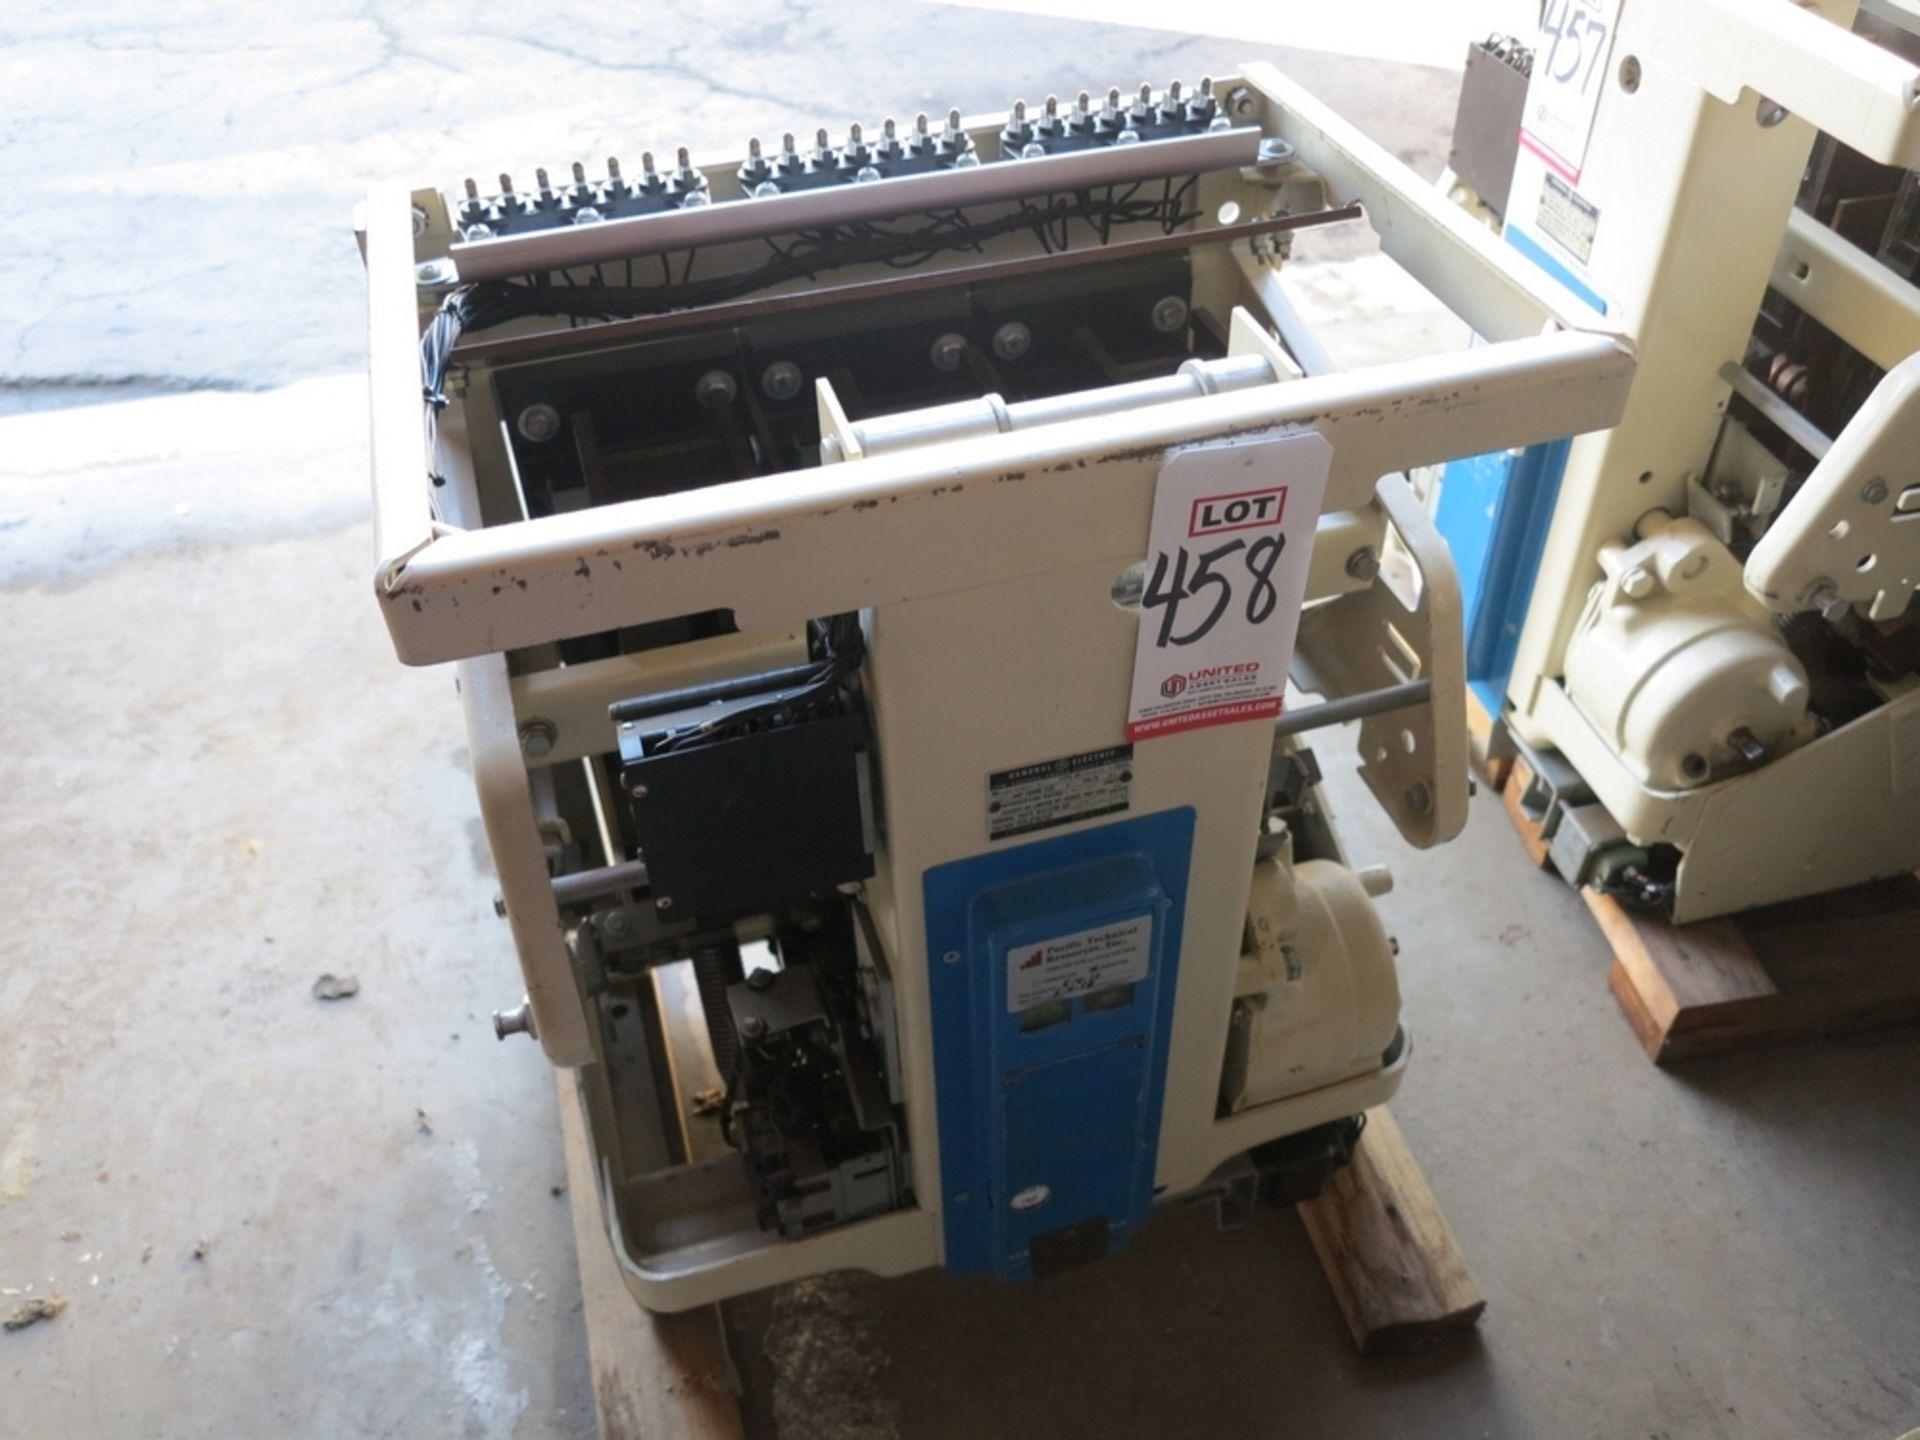 Lot 458 - GE LOW VOLTAGE CIRCUIT BREAKER, 1600 AMP, NO. 156A5854-200